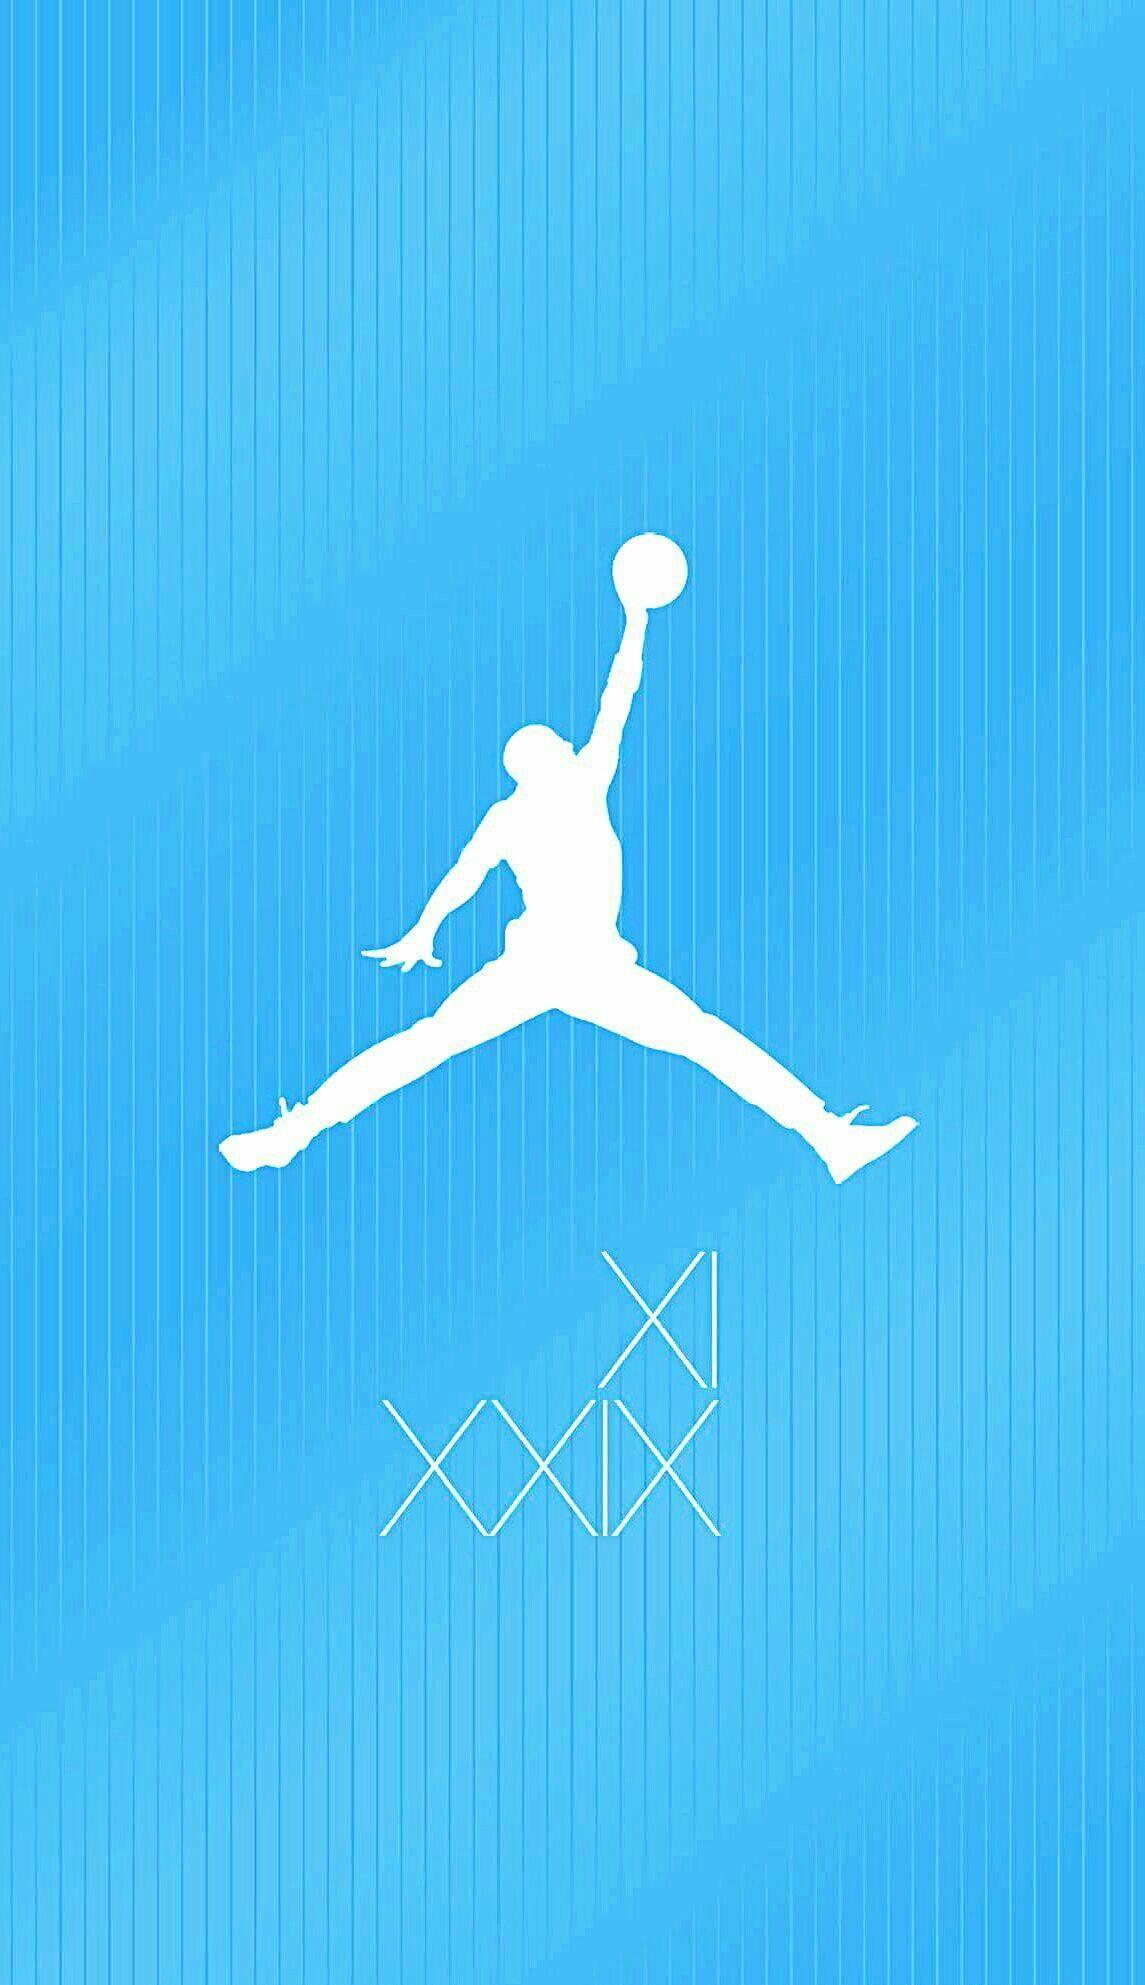 Hypebeast Wallpaper Allezlesbleus Iphone Android Background Owen Sandy Nike Wallpaper Adidas Wallpapers Nike Wallpaper Iphone